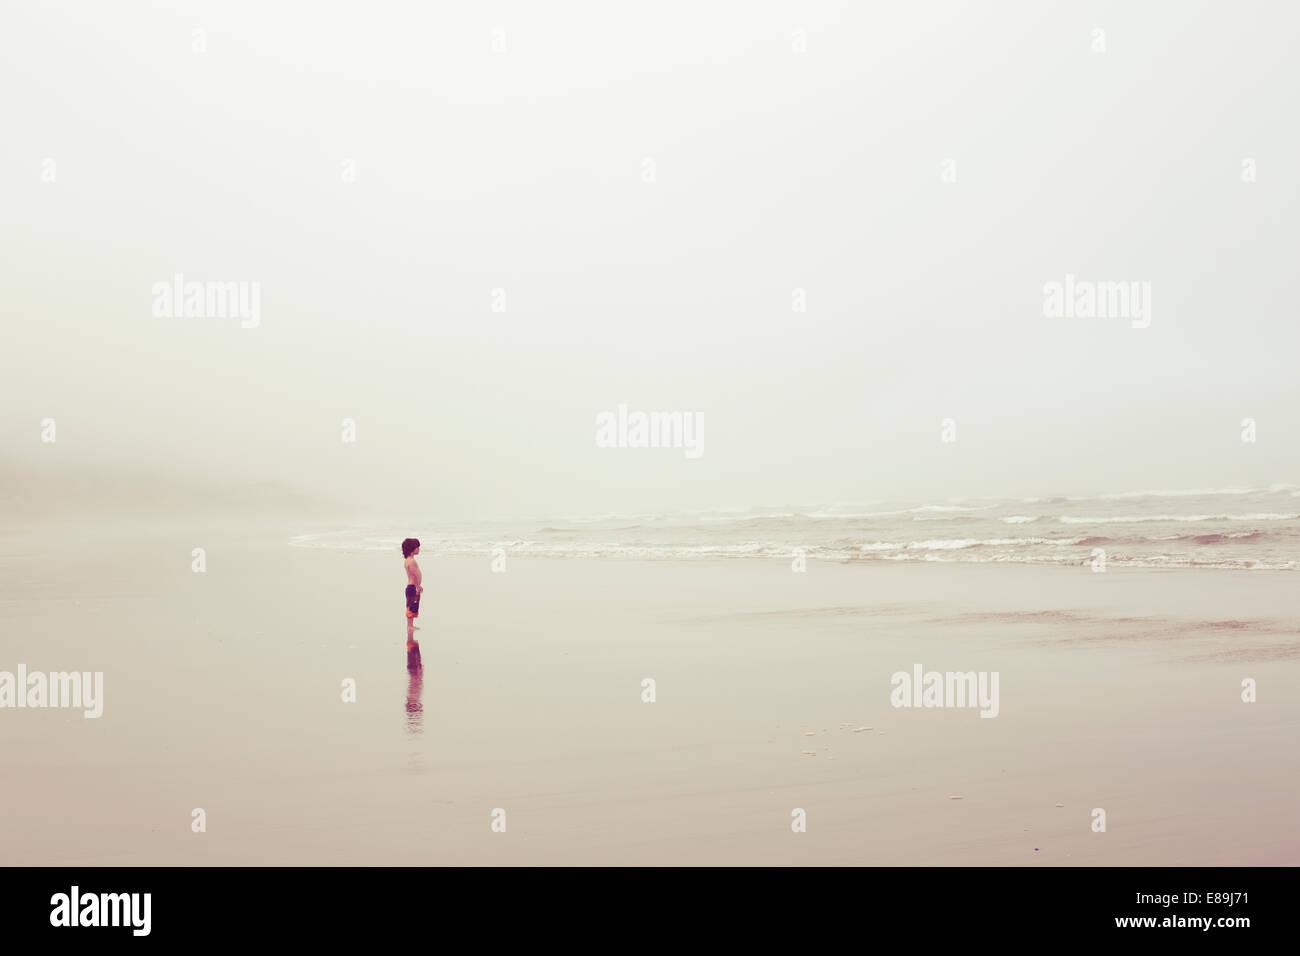 Junge am Meer an bewölkten Tag Stockbild